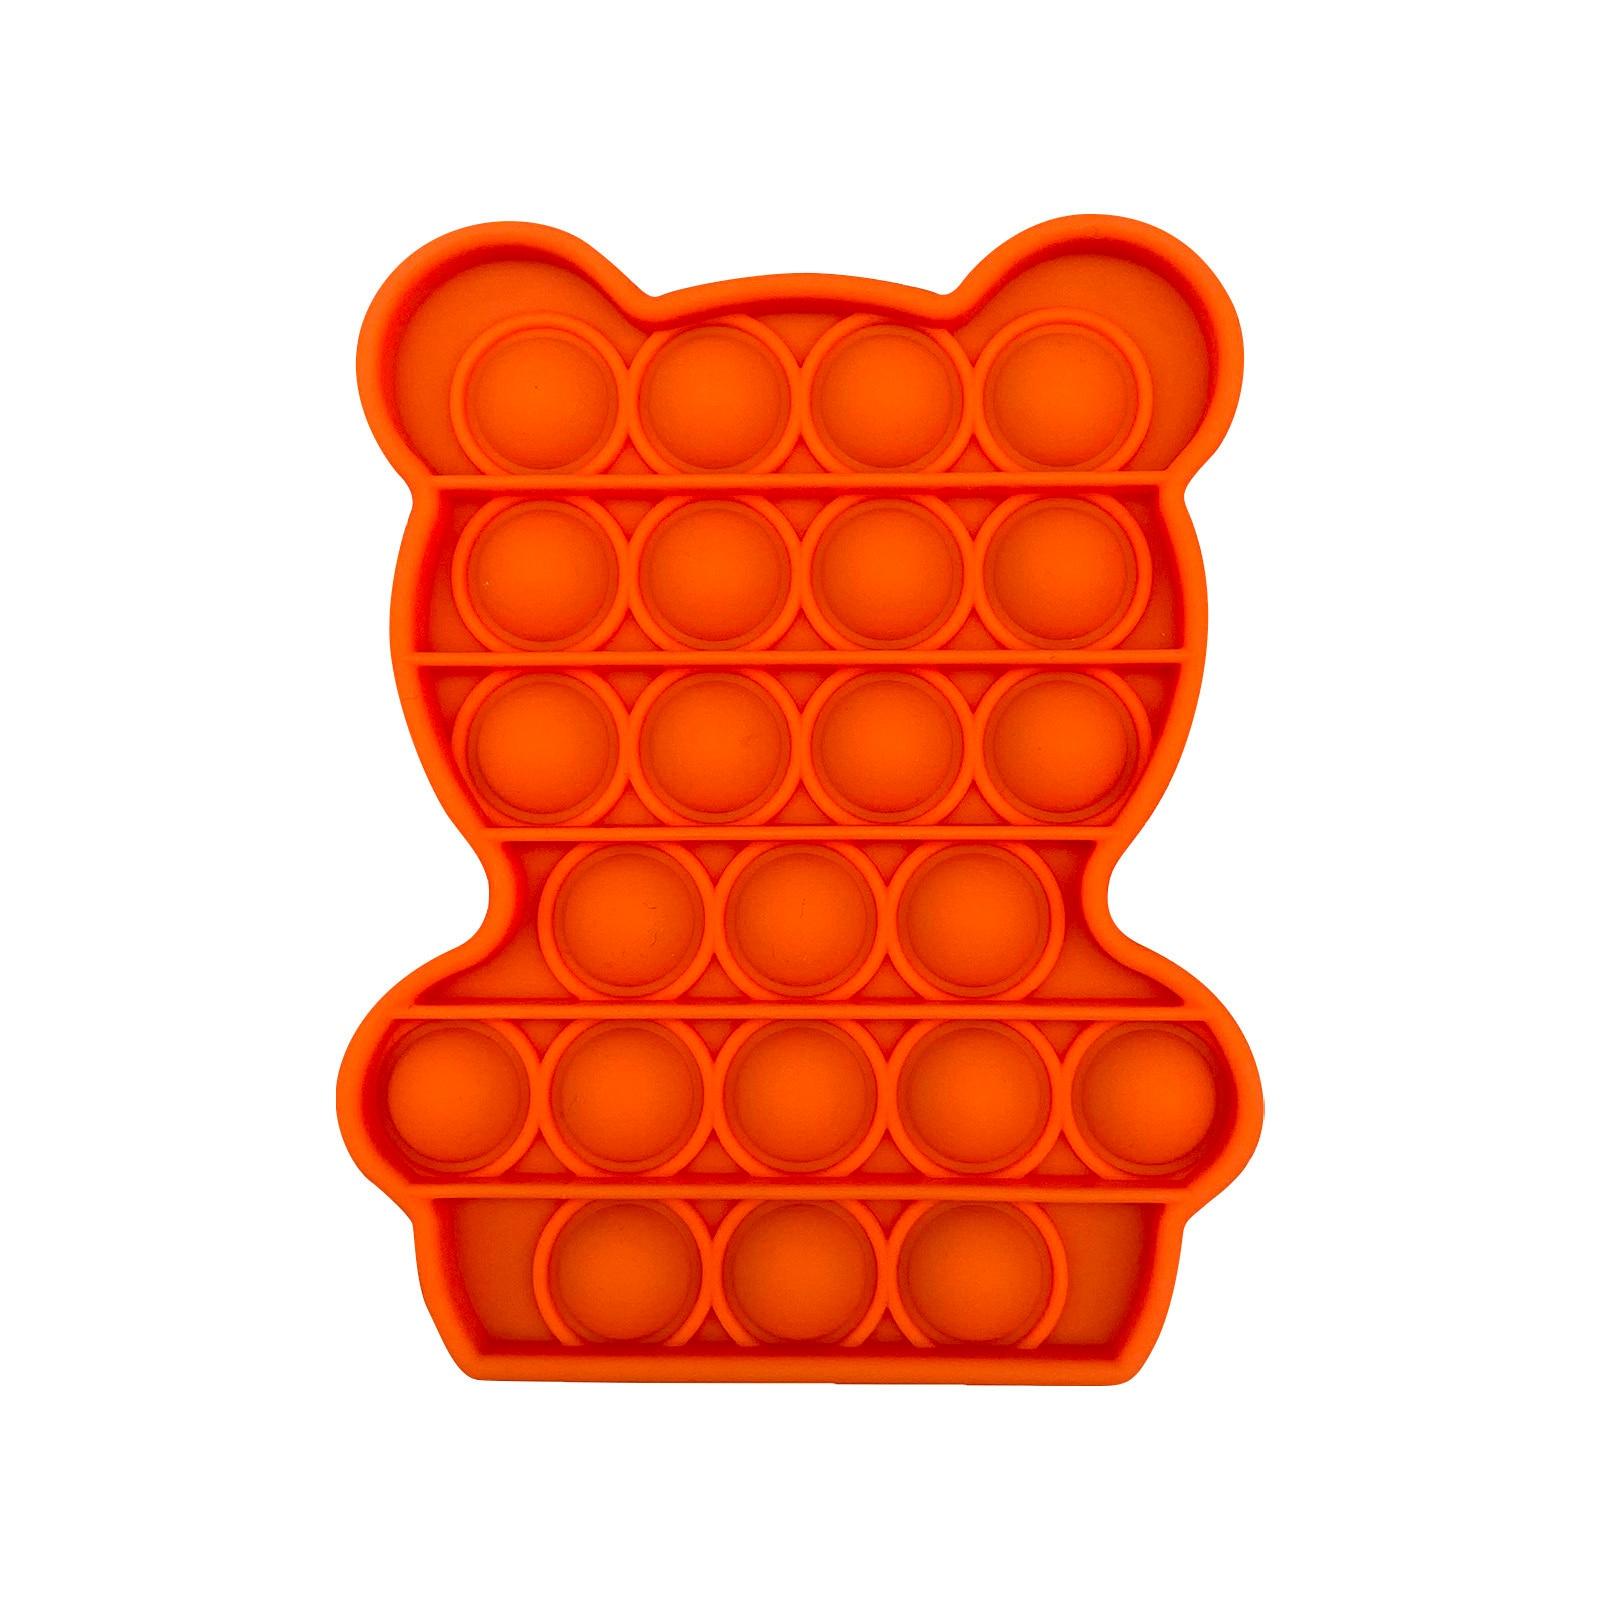 Toys Adult Needs Pops-It-Fidget Anti-Stress Push-Pops Bubble-Sensory-Toy Funny Squishy img4